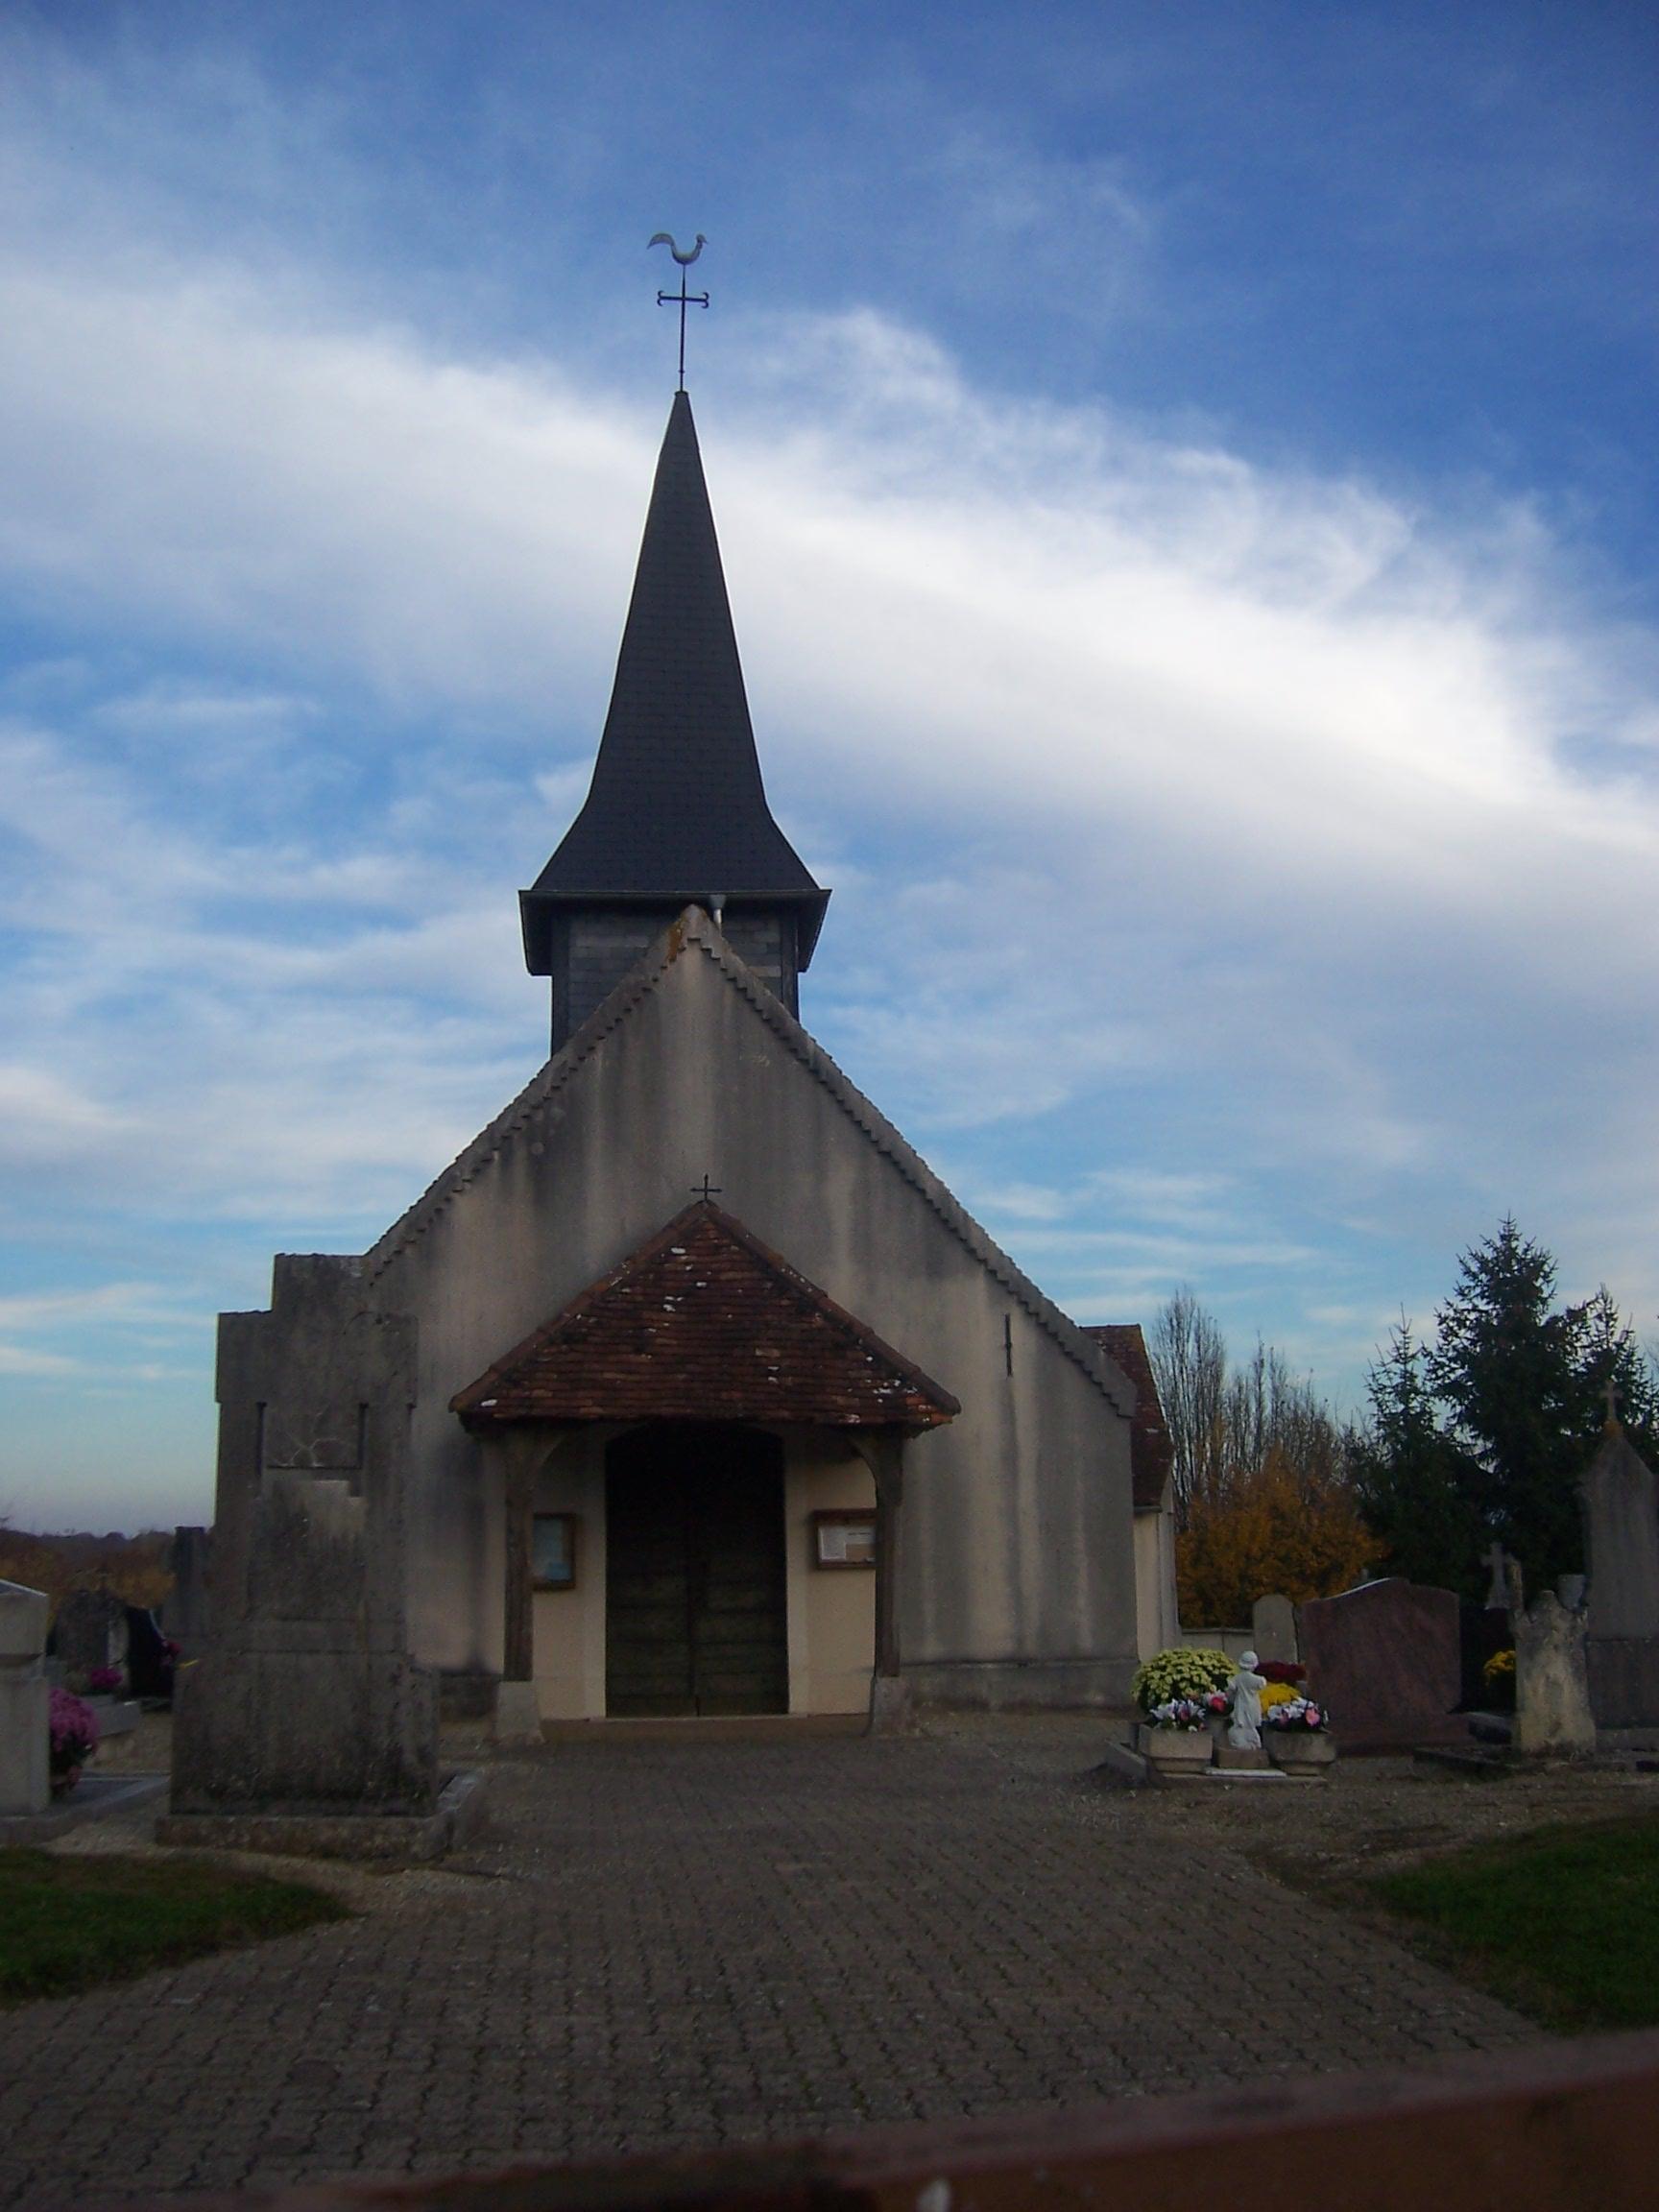 Saint martin du mont sa ne et loire wikipedia for Saone et loire code postal